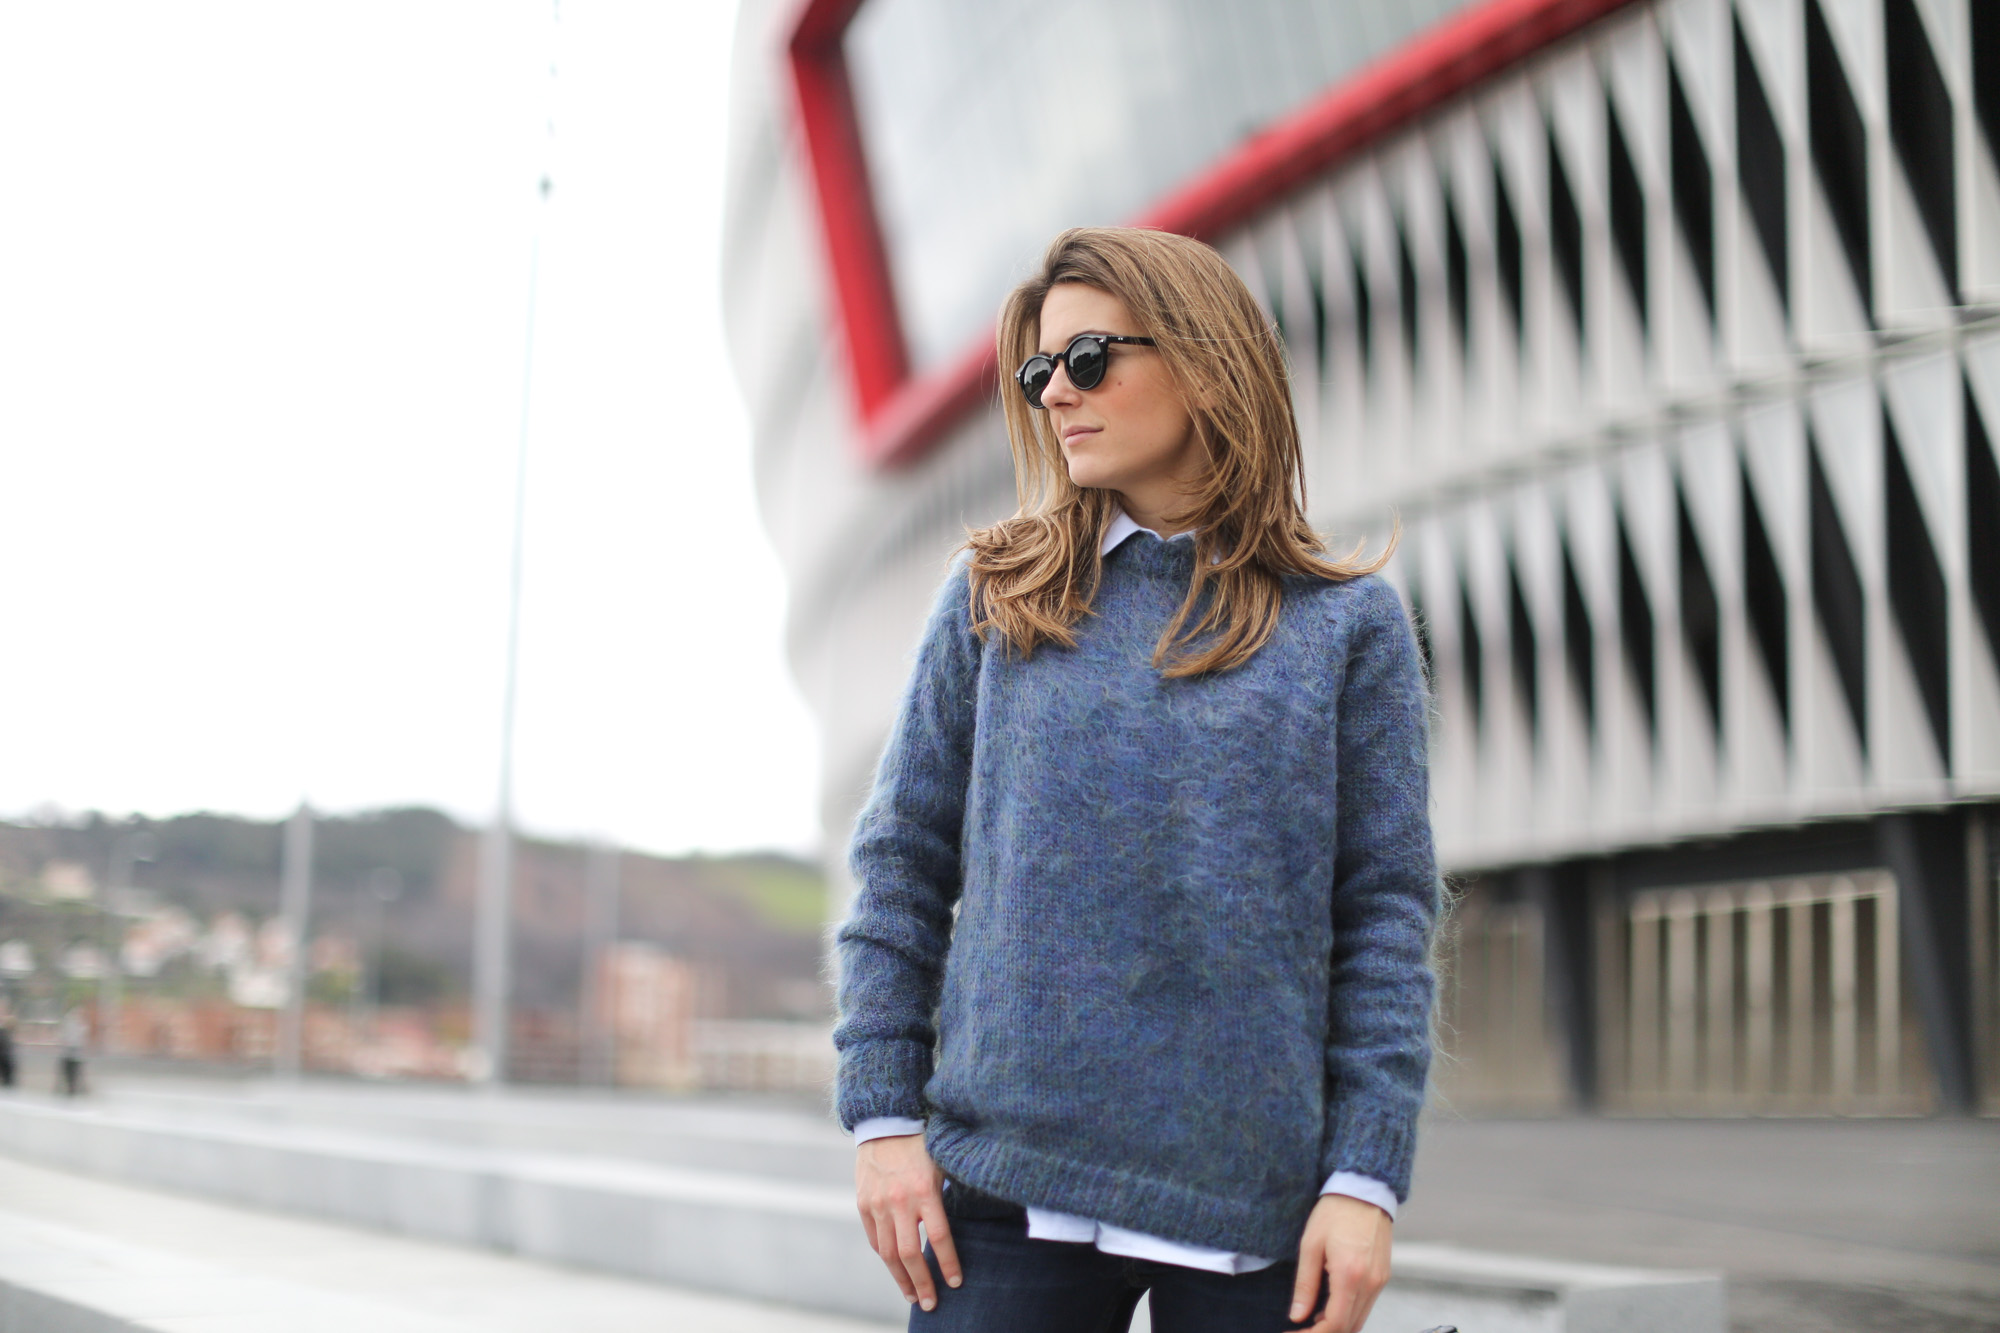 Clochet-streetstyle-bimbaylola-blue-knit-topshop-baxter-jeans-sushibag-14